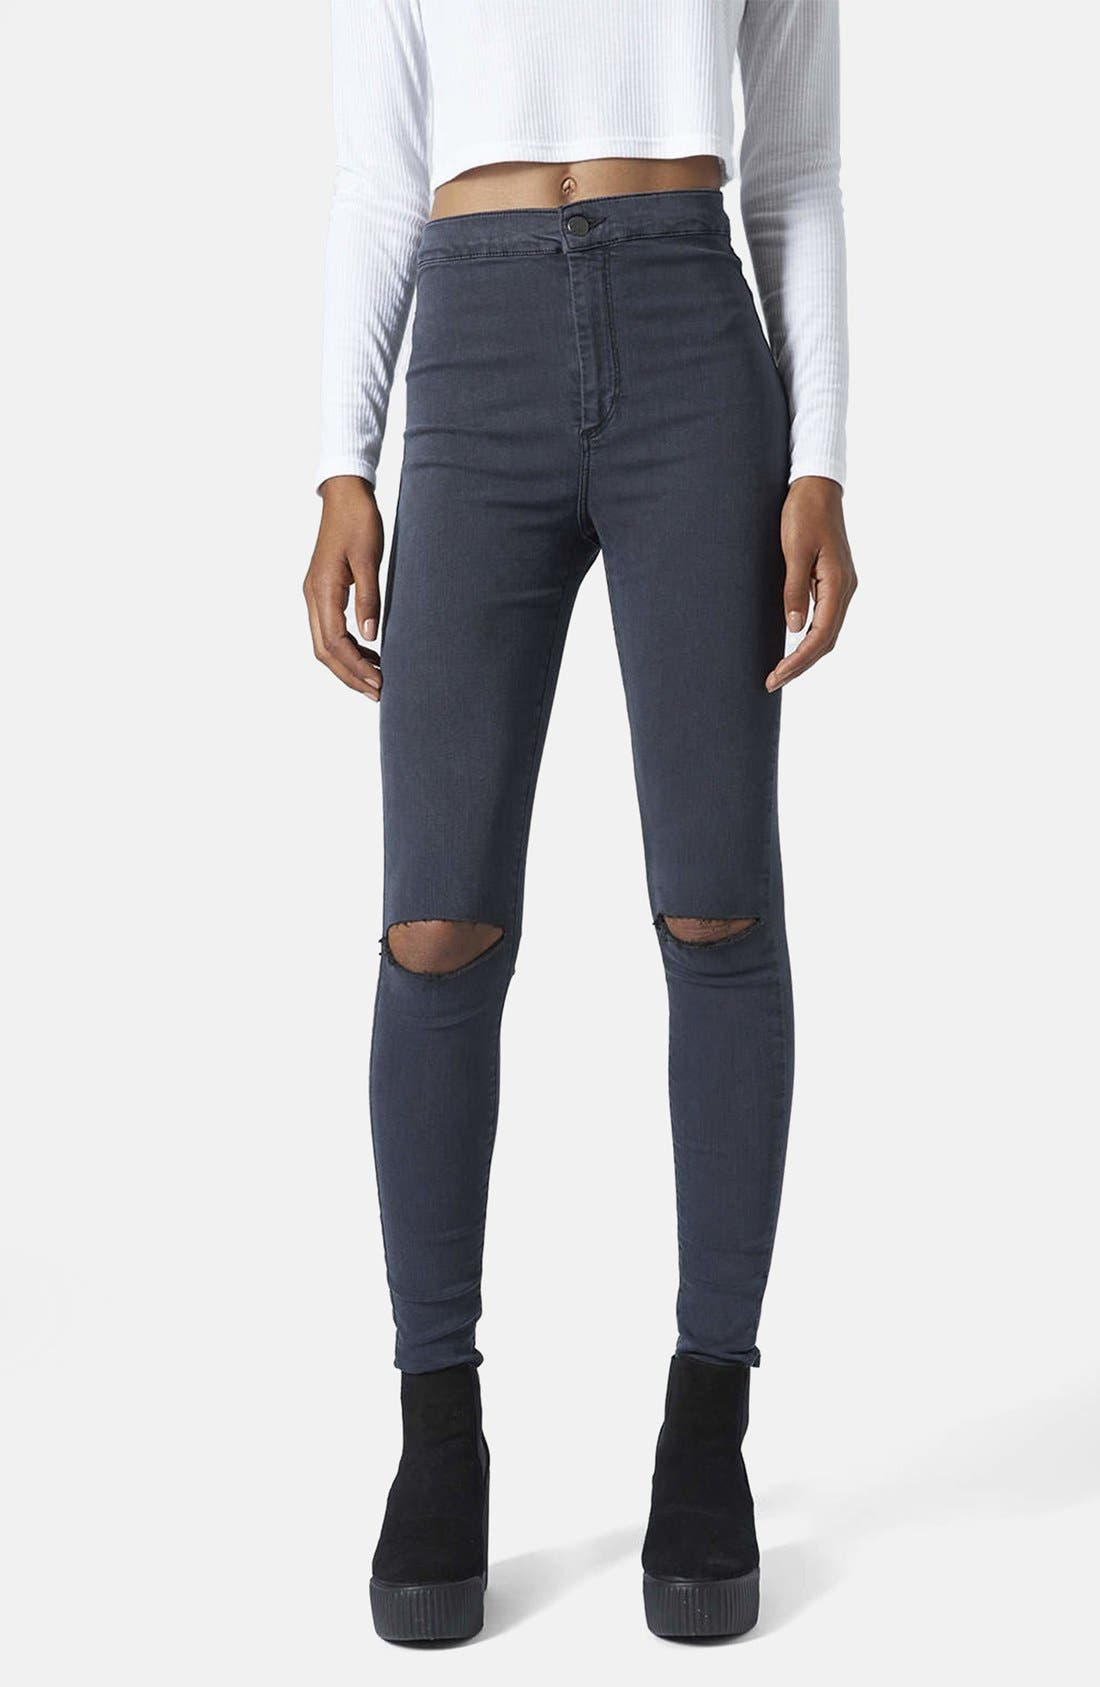 Main Image - Topshop Moto 'Joni' Ripped Jeans (Blue) (Regular & Short)